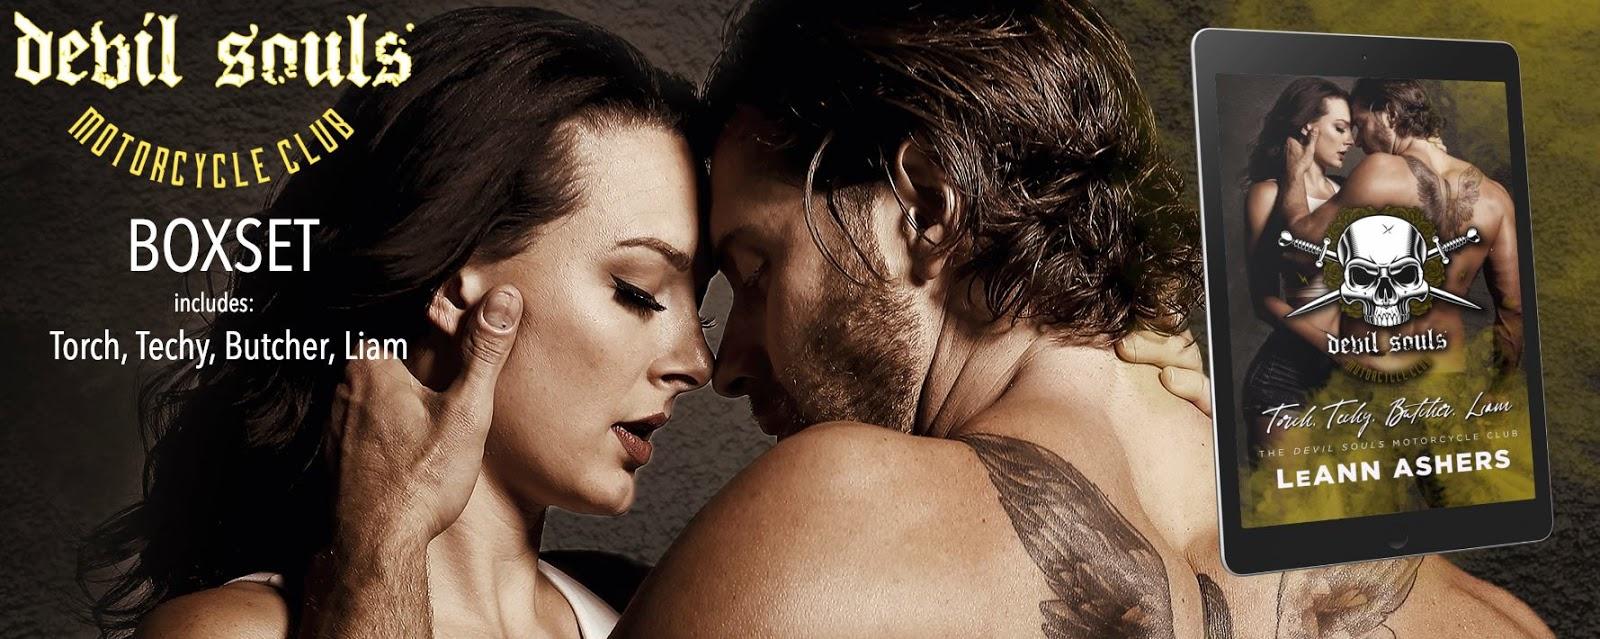 Alyssa Leblanc Nude leann ashers ~ the devil souls mc: box set ~ release blitz